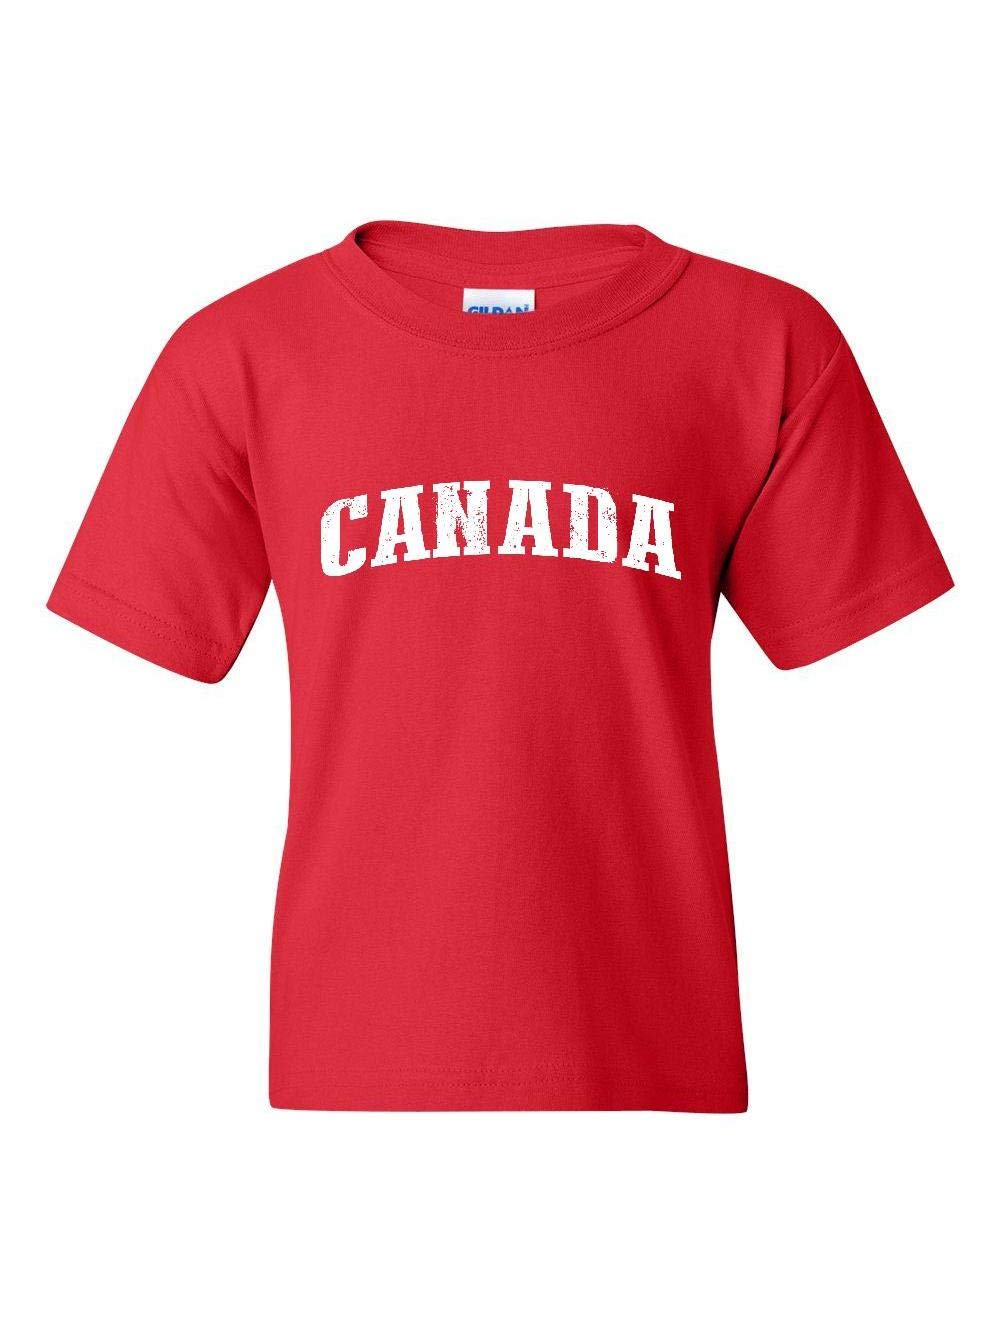 Mom S Favorite Canada Flag Canadian Traveler S Gift Unisex T Shirt 2119